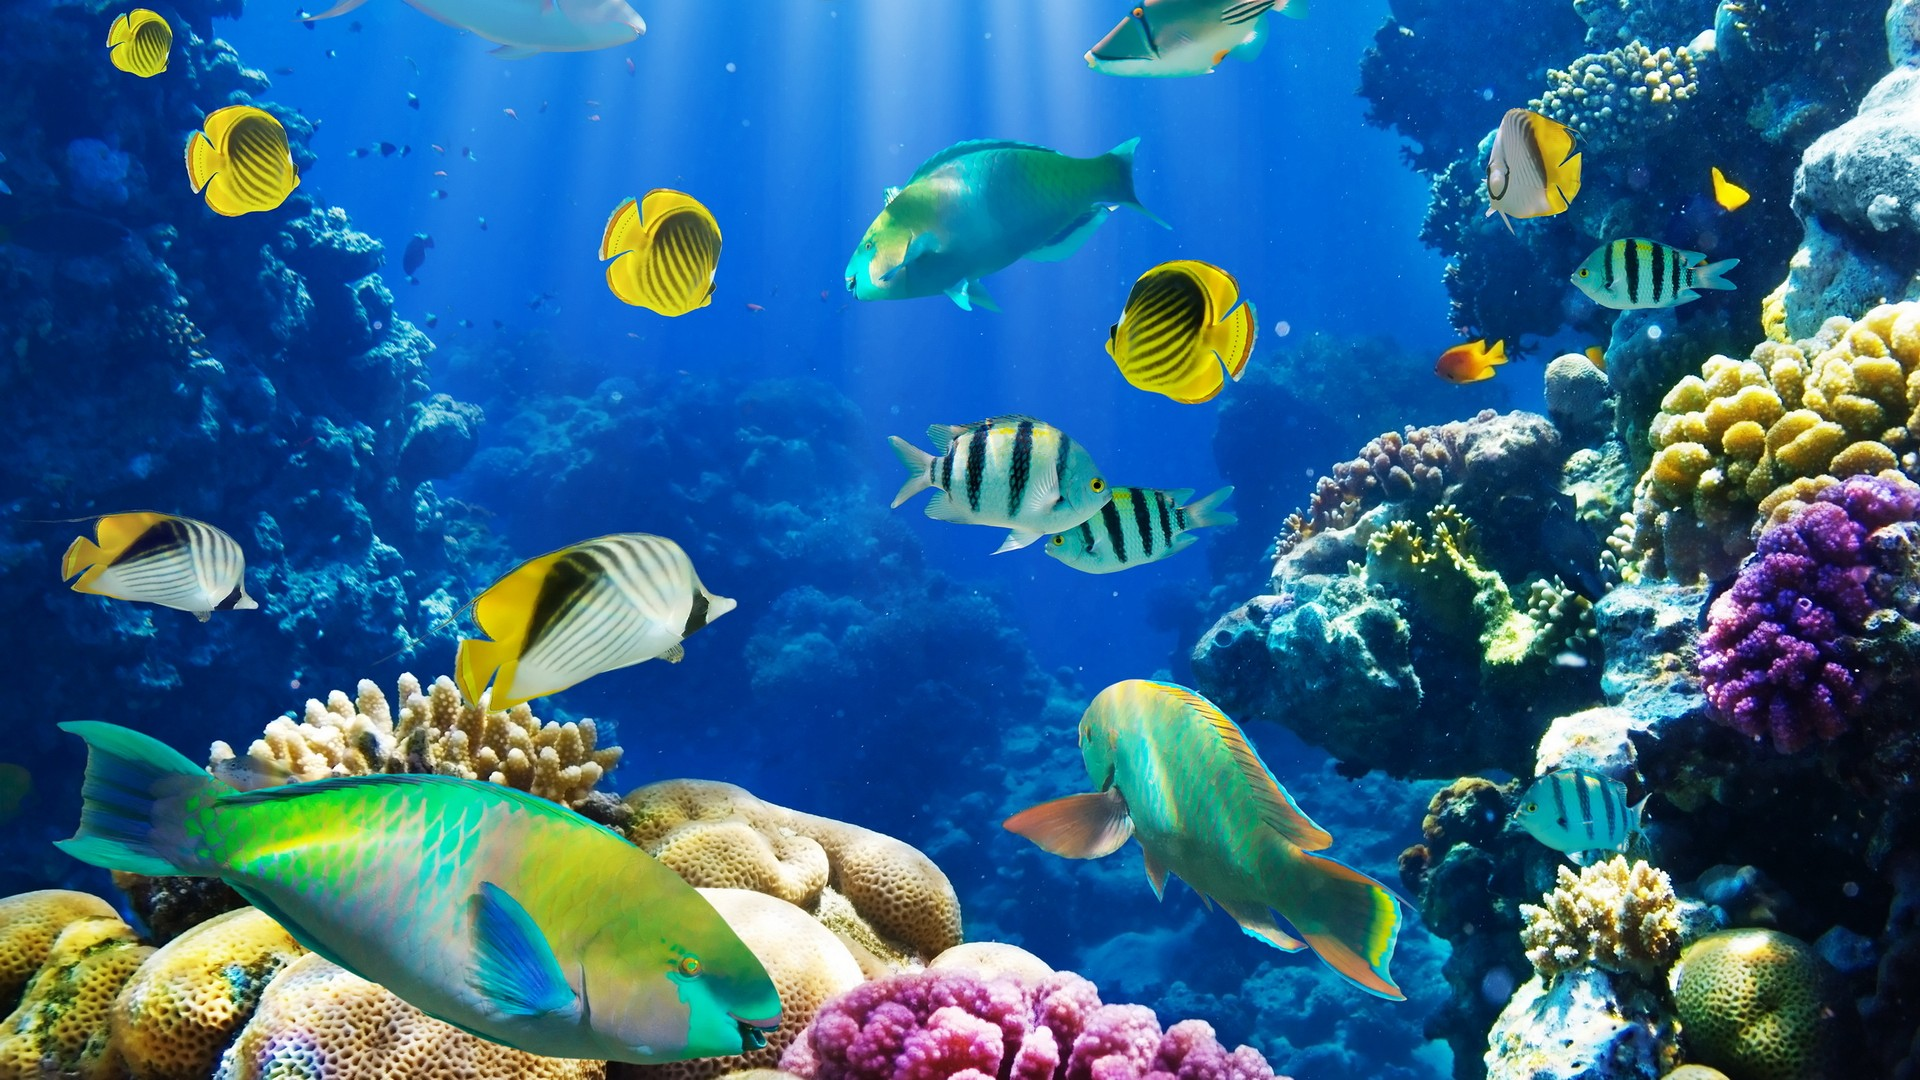 Nature Fish Wallpaper 1920x1080 Nature Fish Coral Reef Exotic 1920x1080